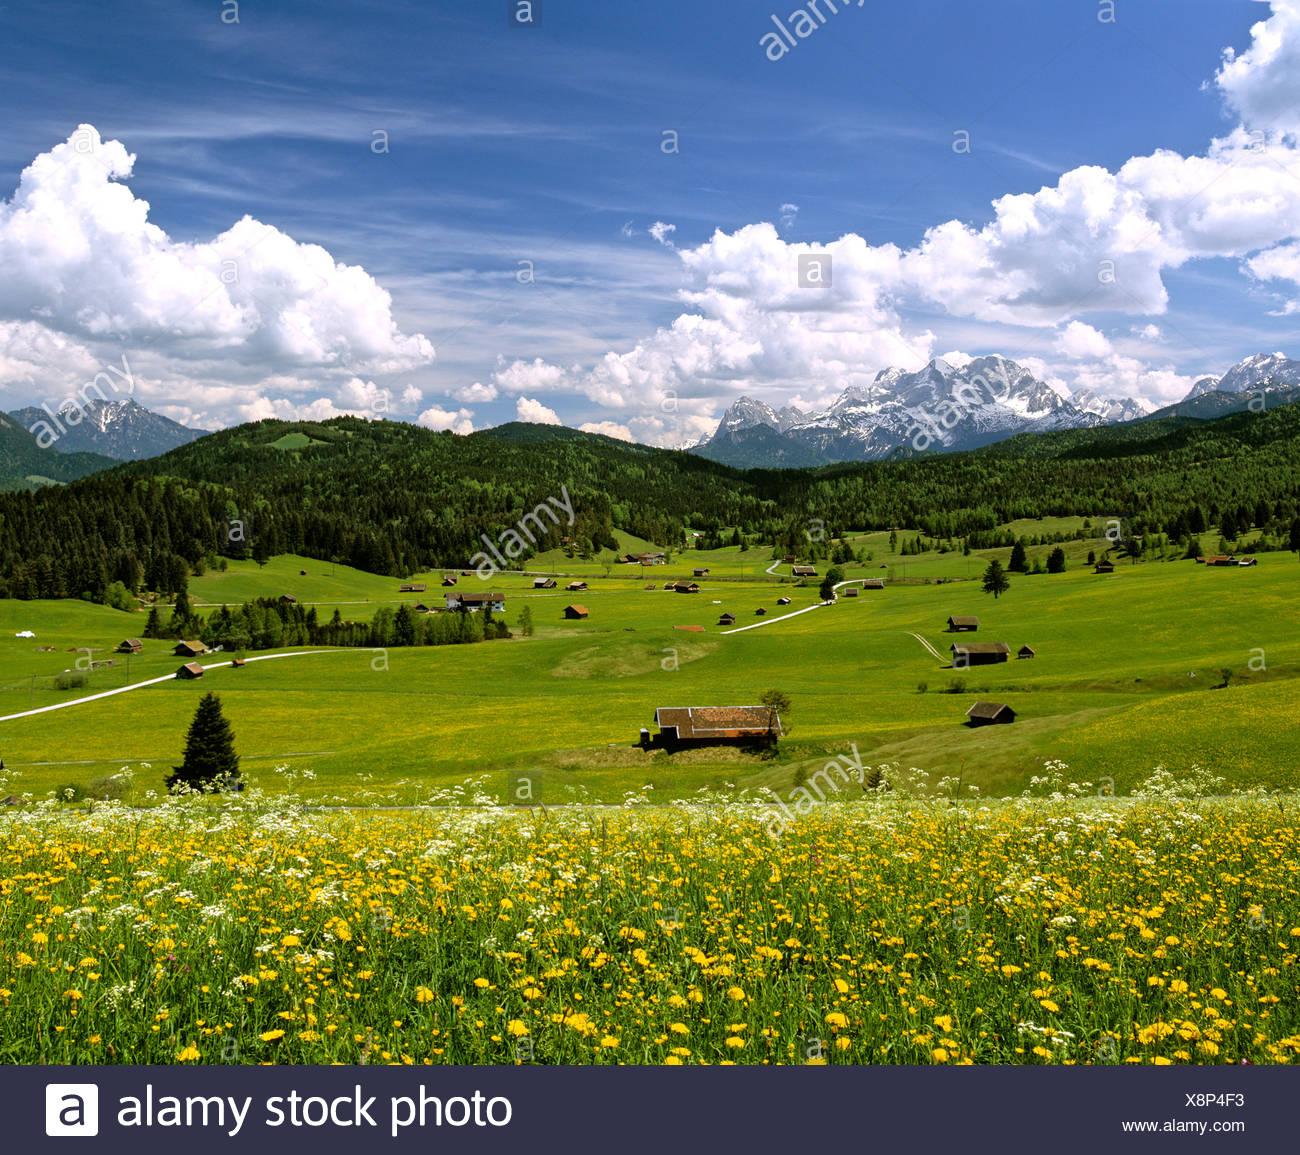 Tonihof Wildlife Park, Flower meadow in spring, Wetterstein Range, Mittenwald Forest, Upper Bavaria, Bavaria, Germany, Europe Stock Photo